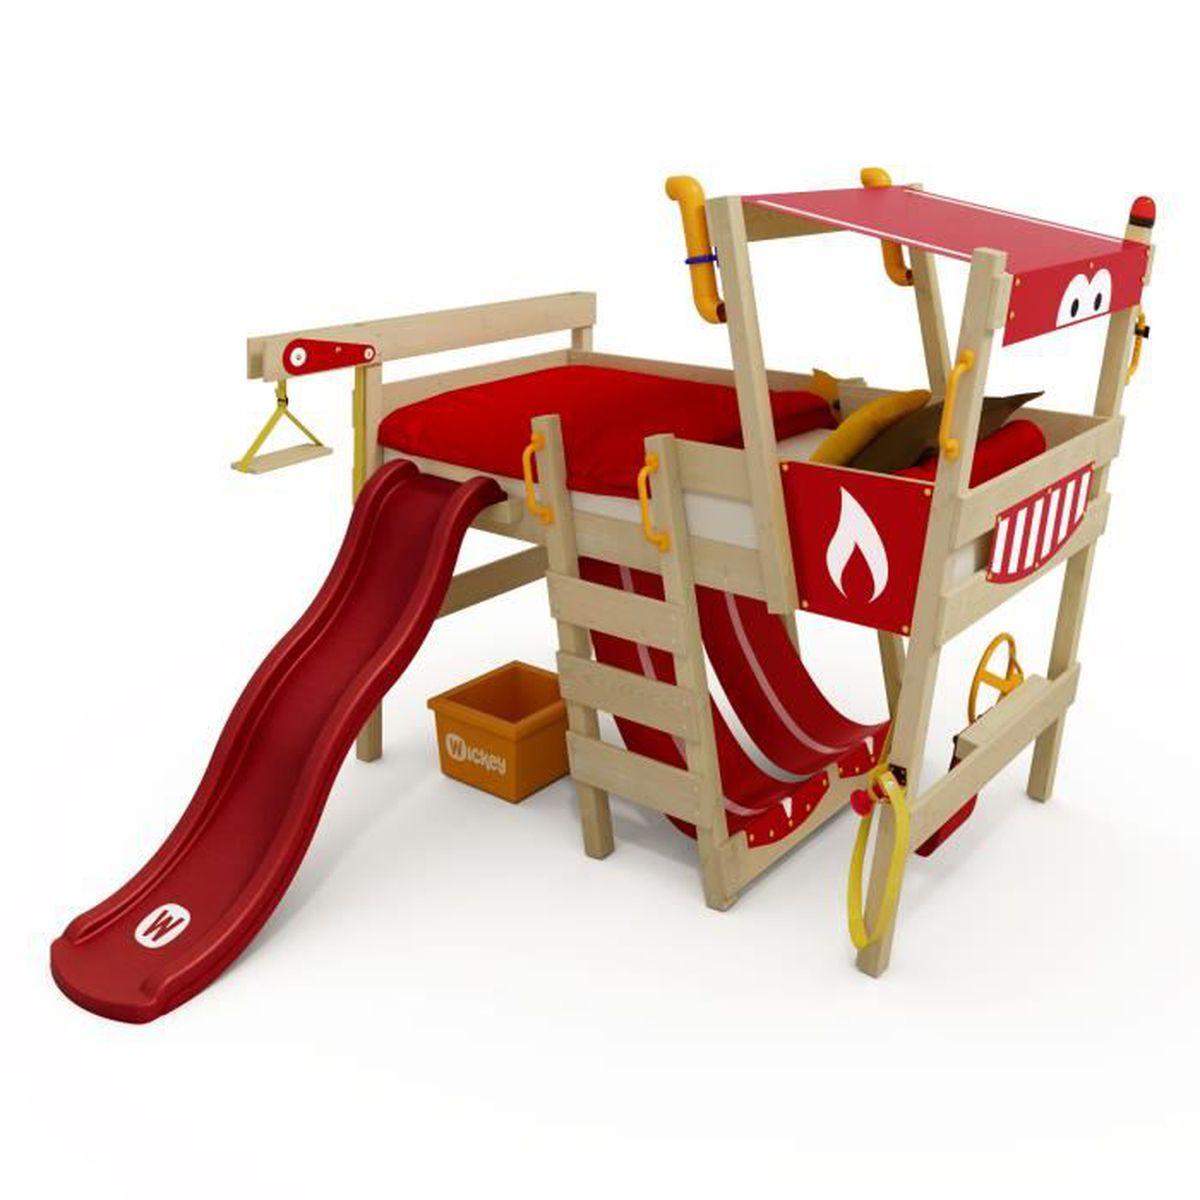 Lit Mezzanine 3 Ans wickey lit pour enfant en bois crazy smoky lit mezzanine